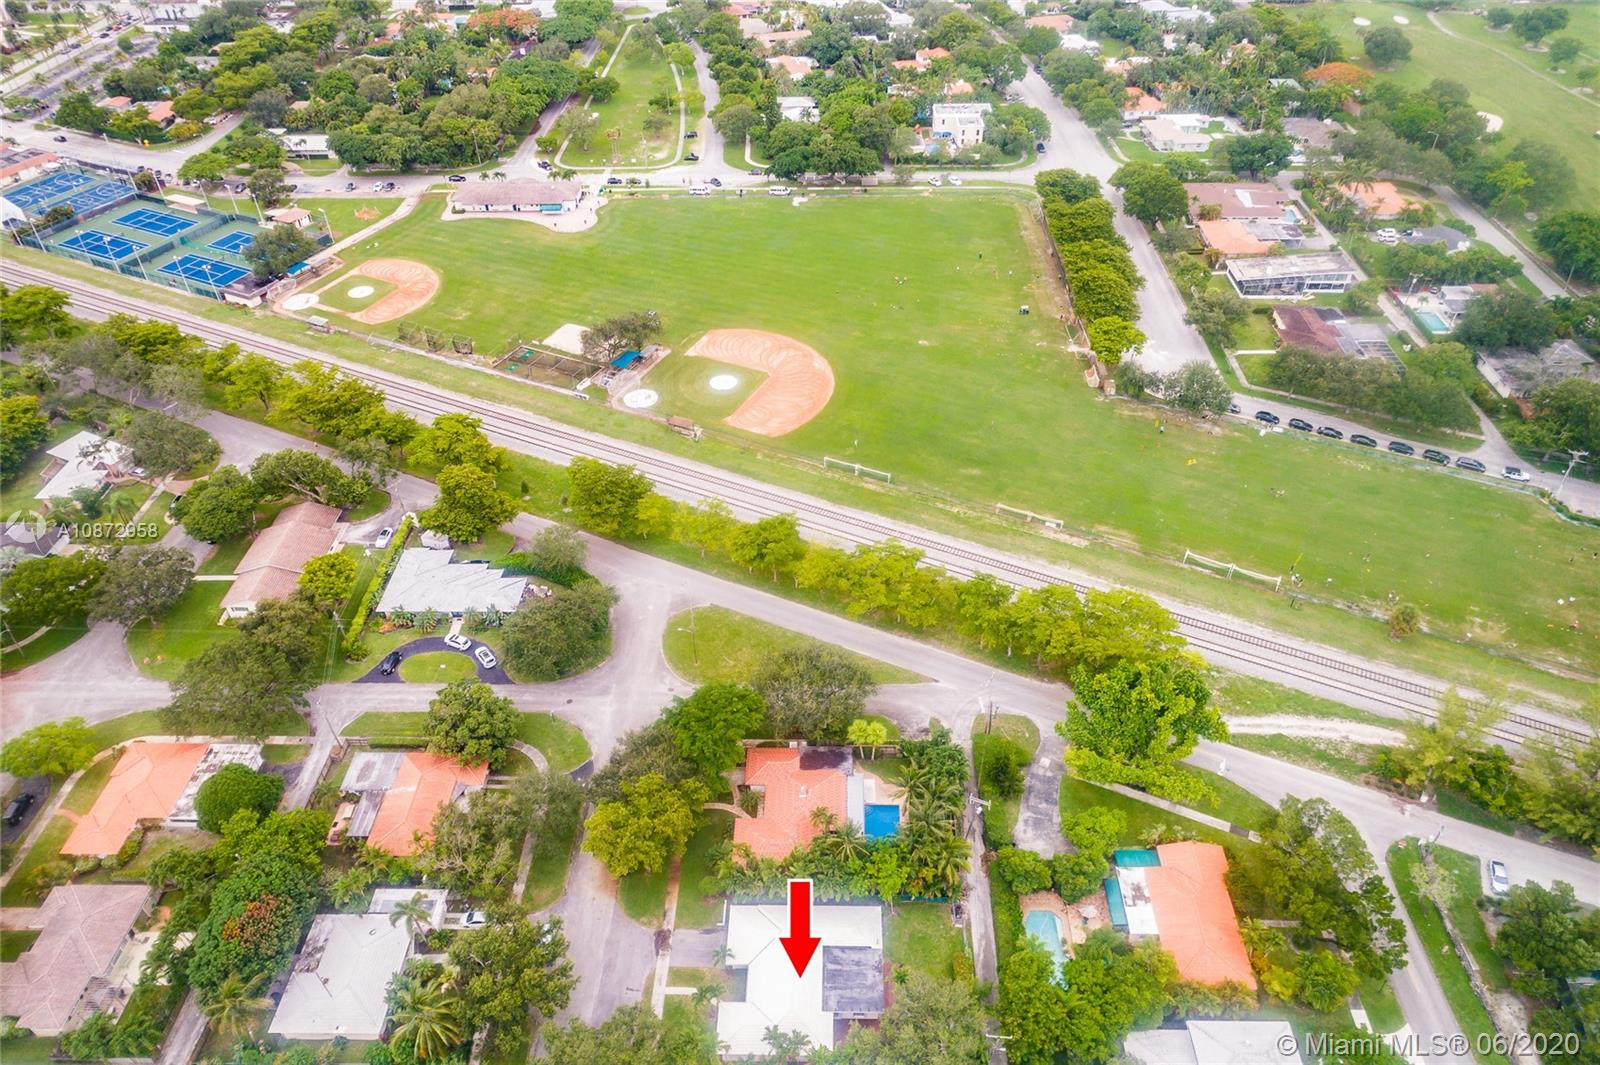 Miami Shores # - 42 - photo